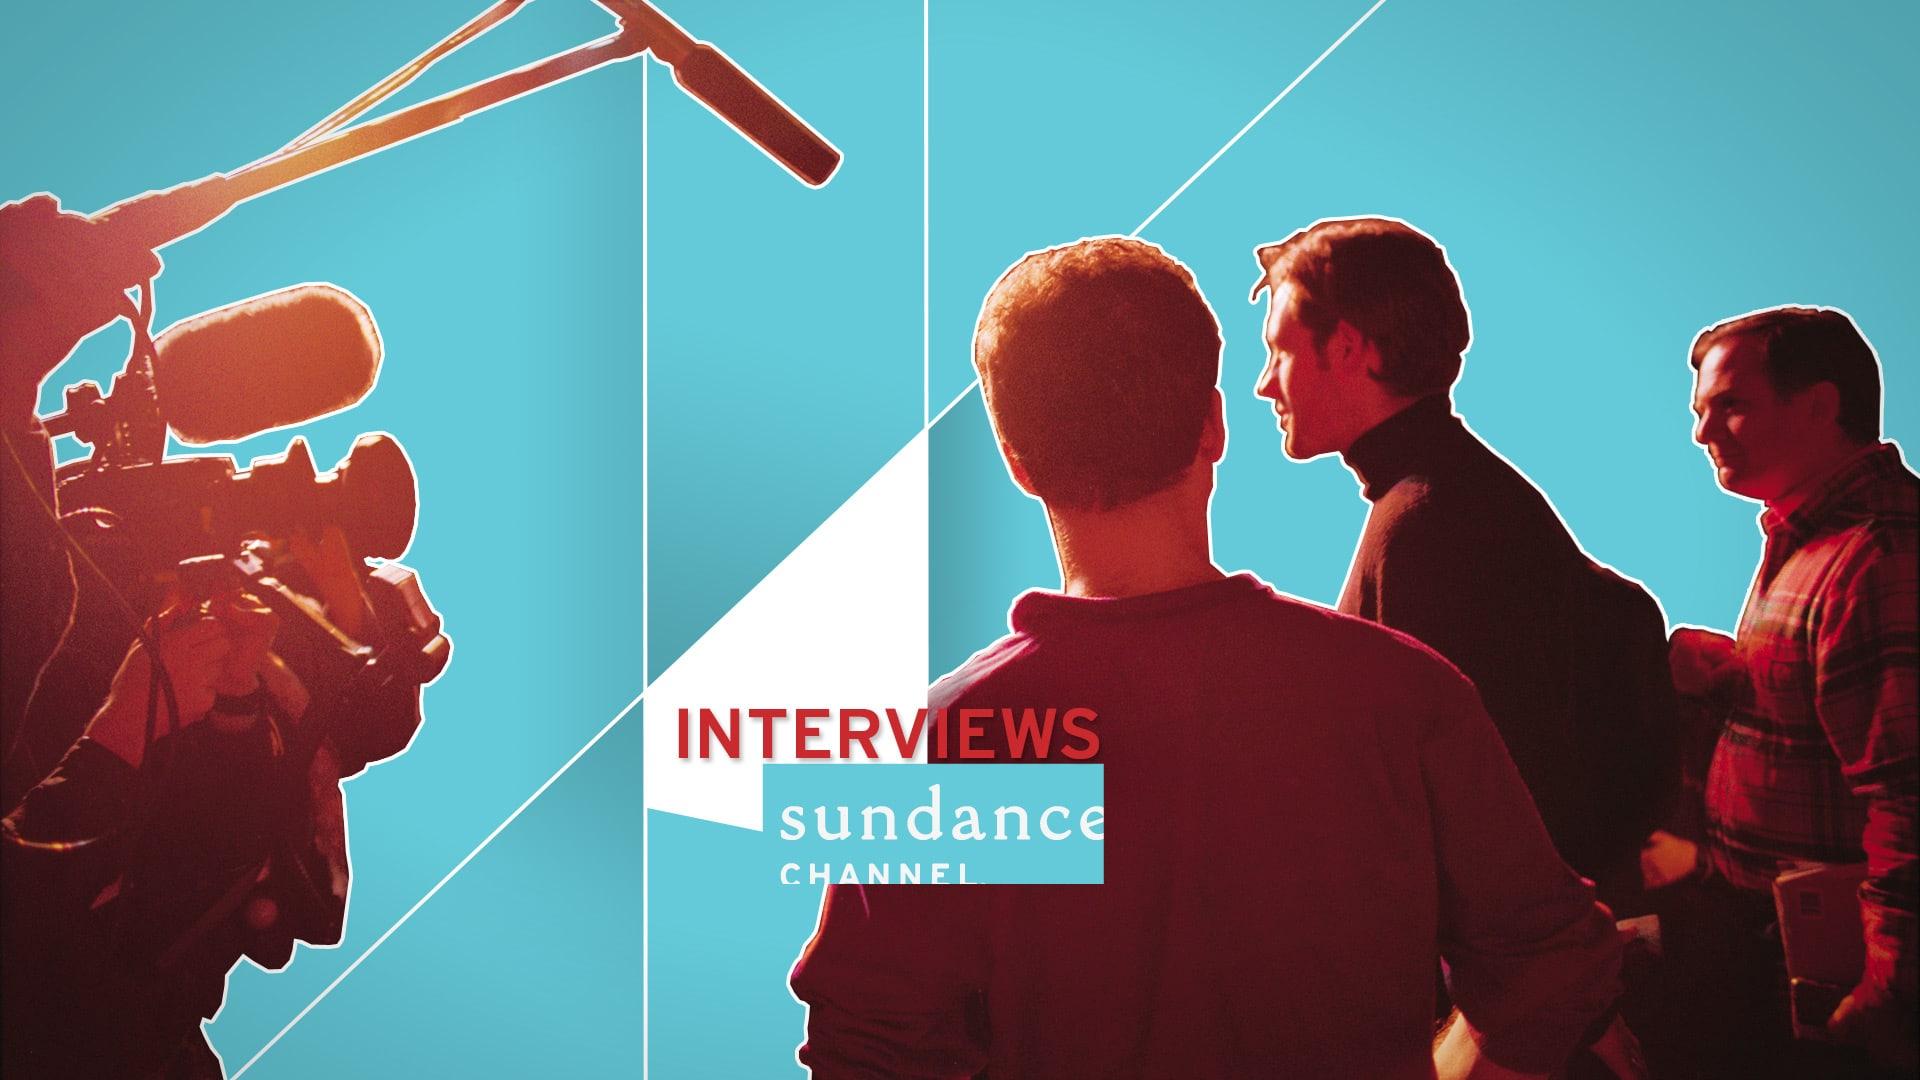 Sundance_INT-victor-ruano